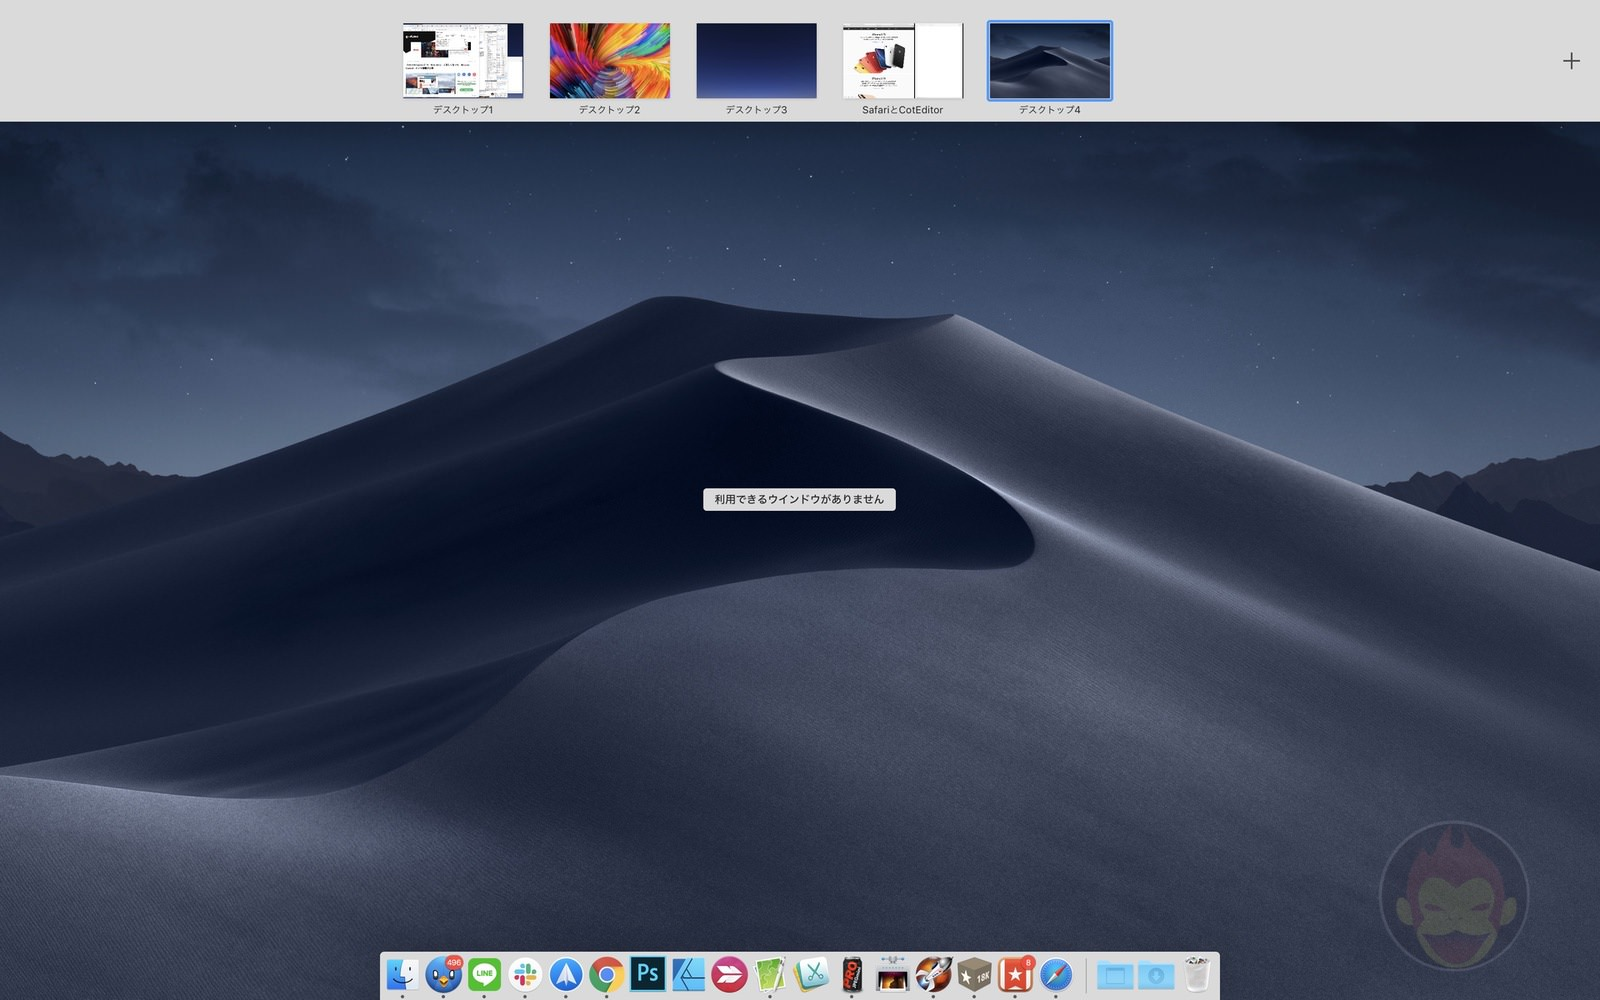 How-to-Use-Split-View-on-Mac-06.jpg